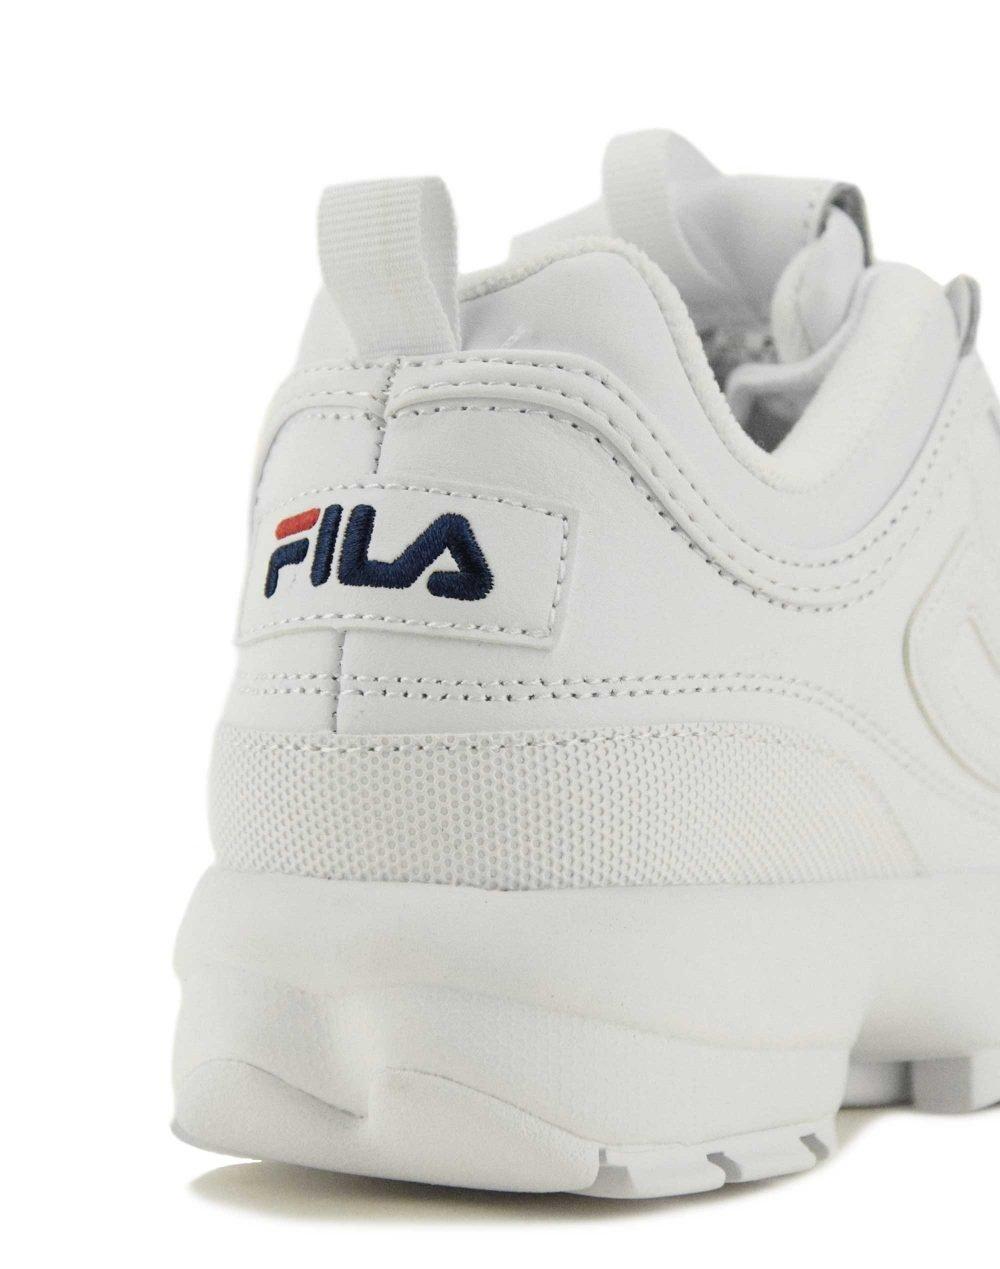 Fila Disruptor II Premium (5FM00002-125) White